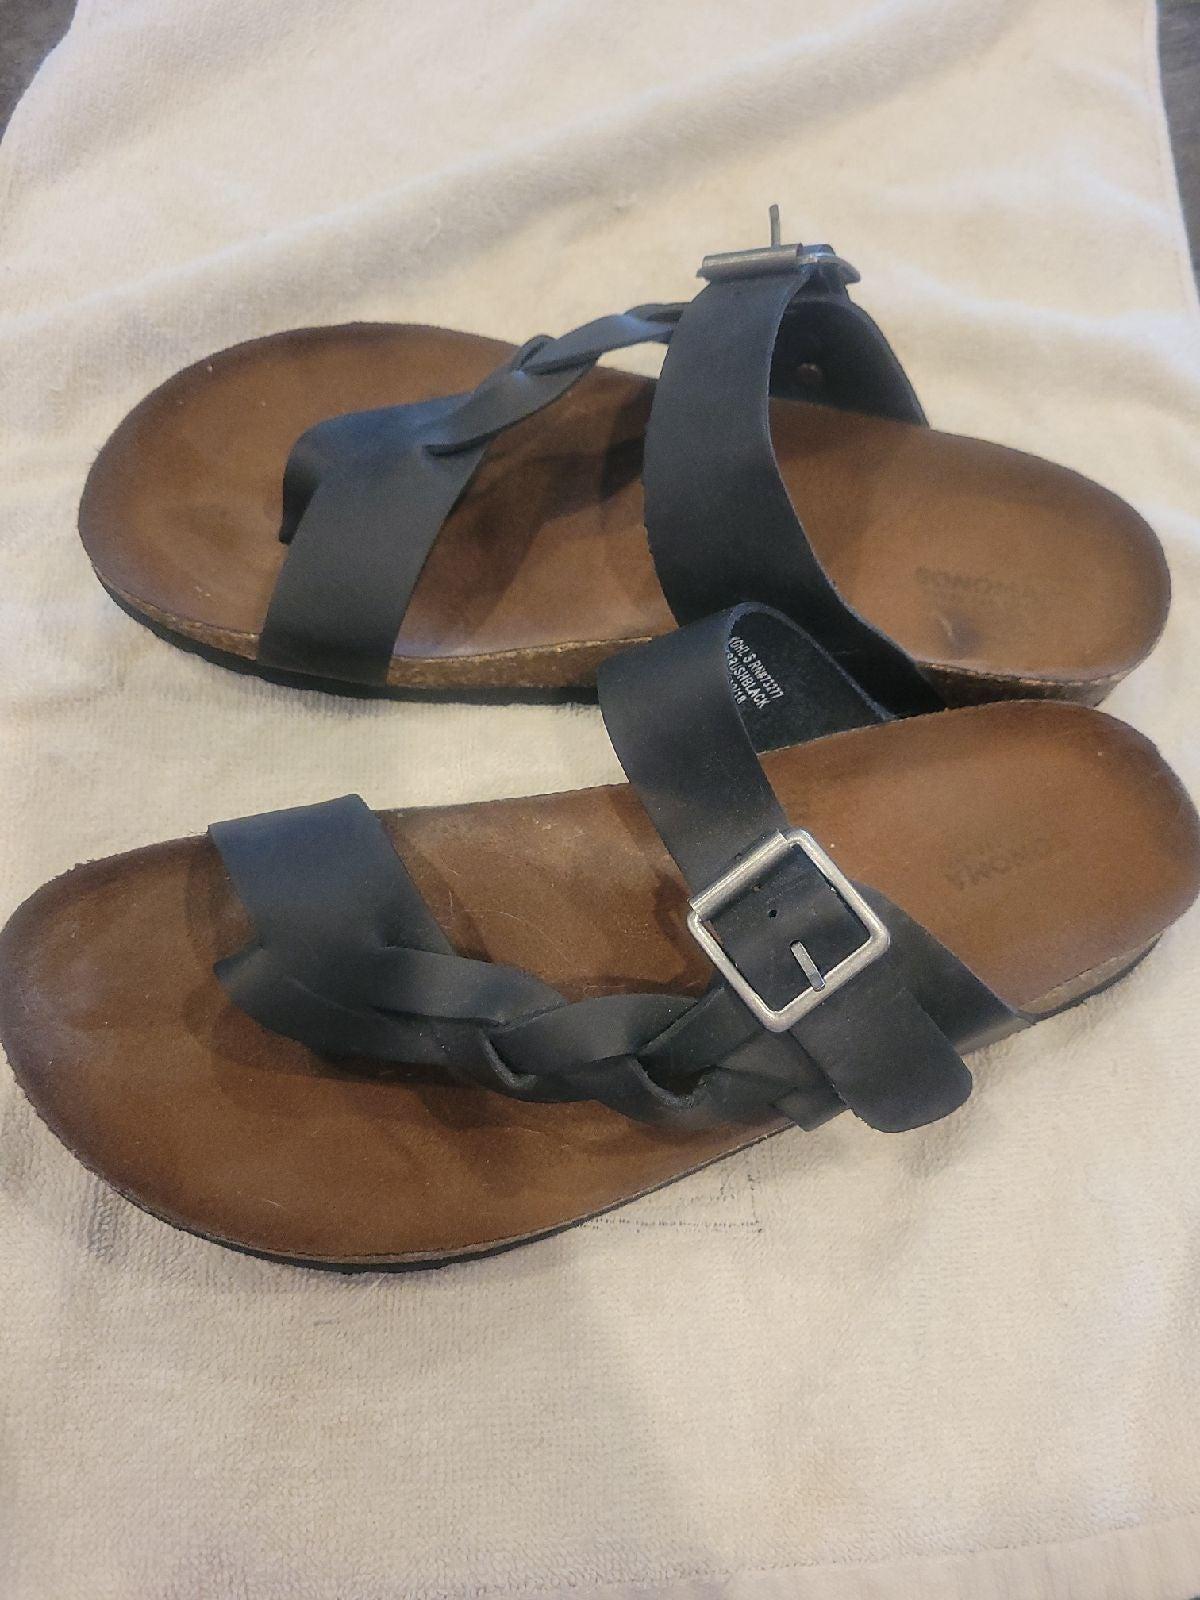 Sonoma Sandals similar to Birkenstock